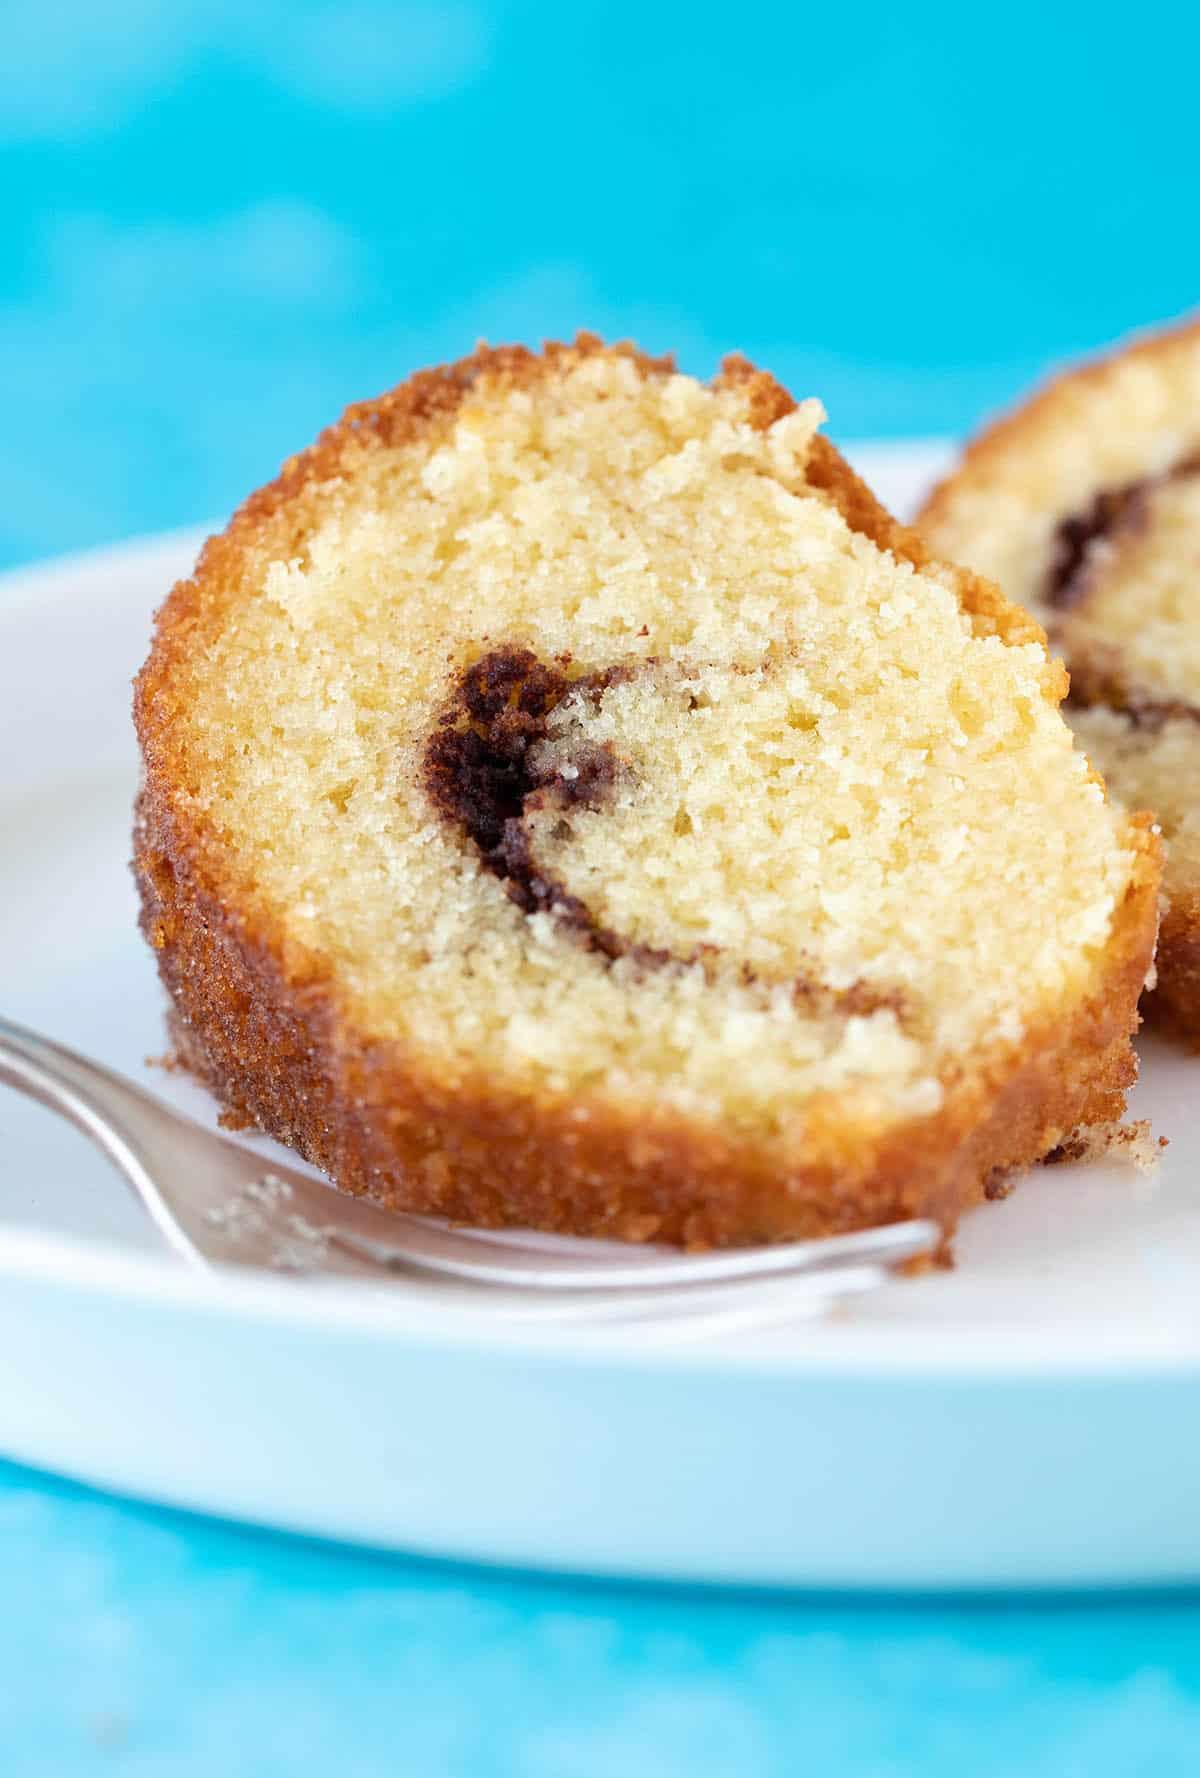 A close up photo of Cinnamon Swirl Bundt Cake